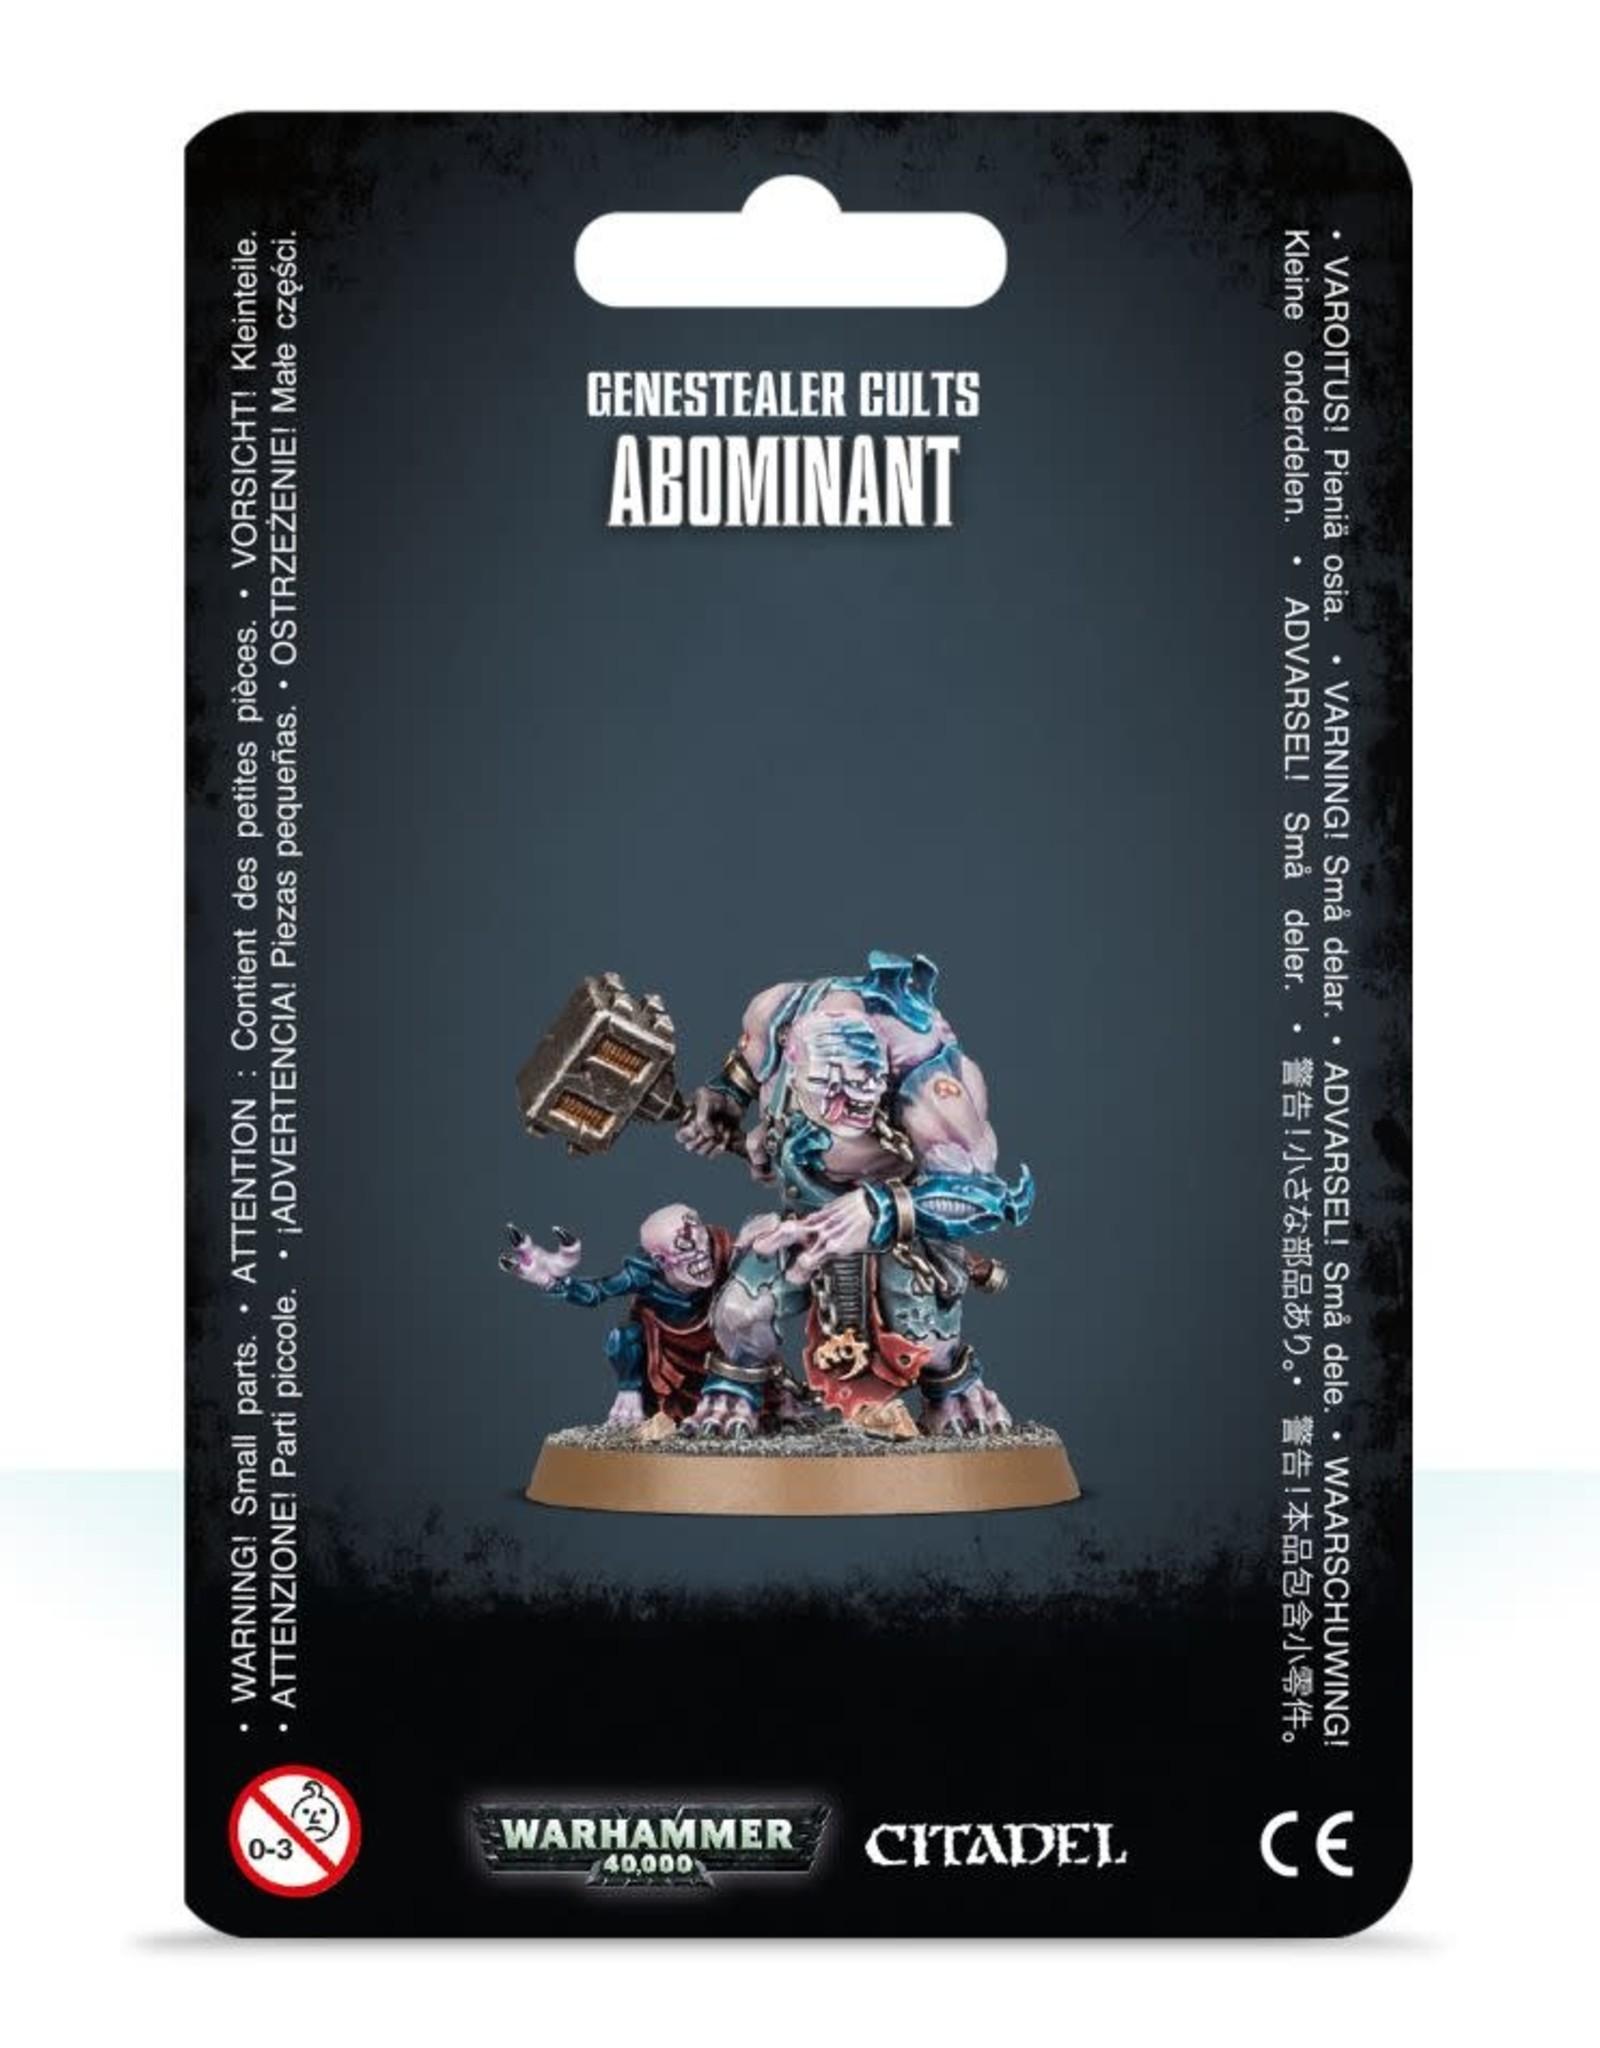 Warhammer 40K Genestealer Cults Abominant